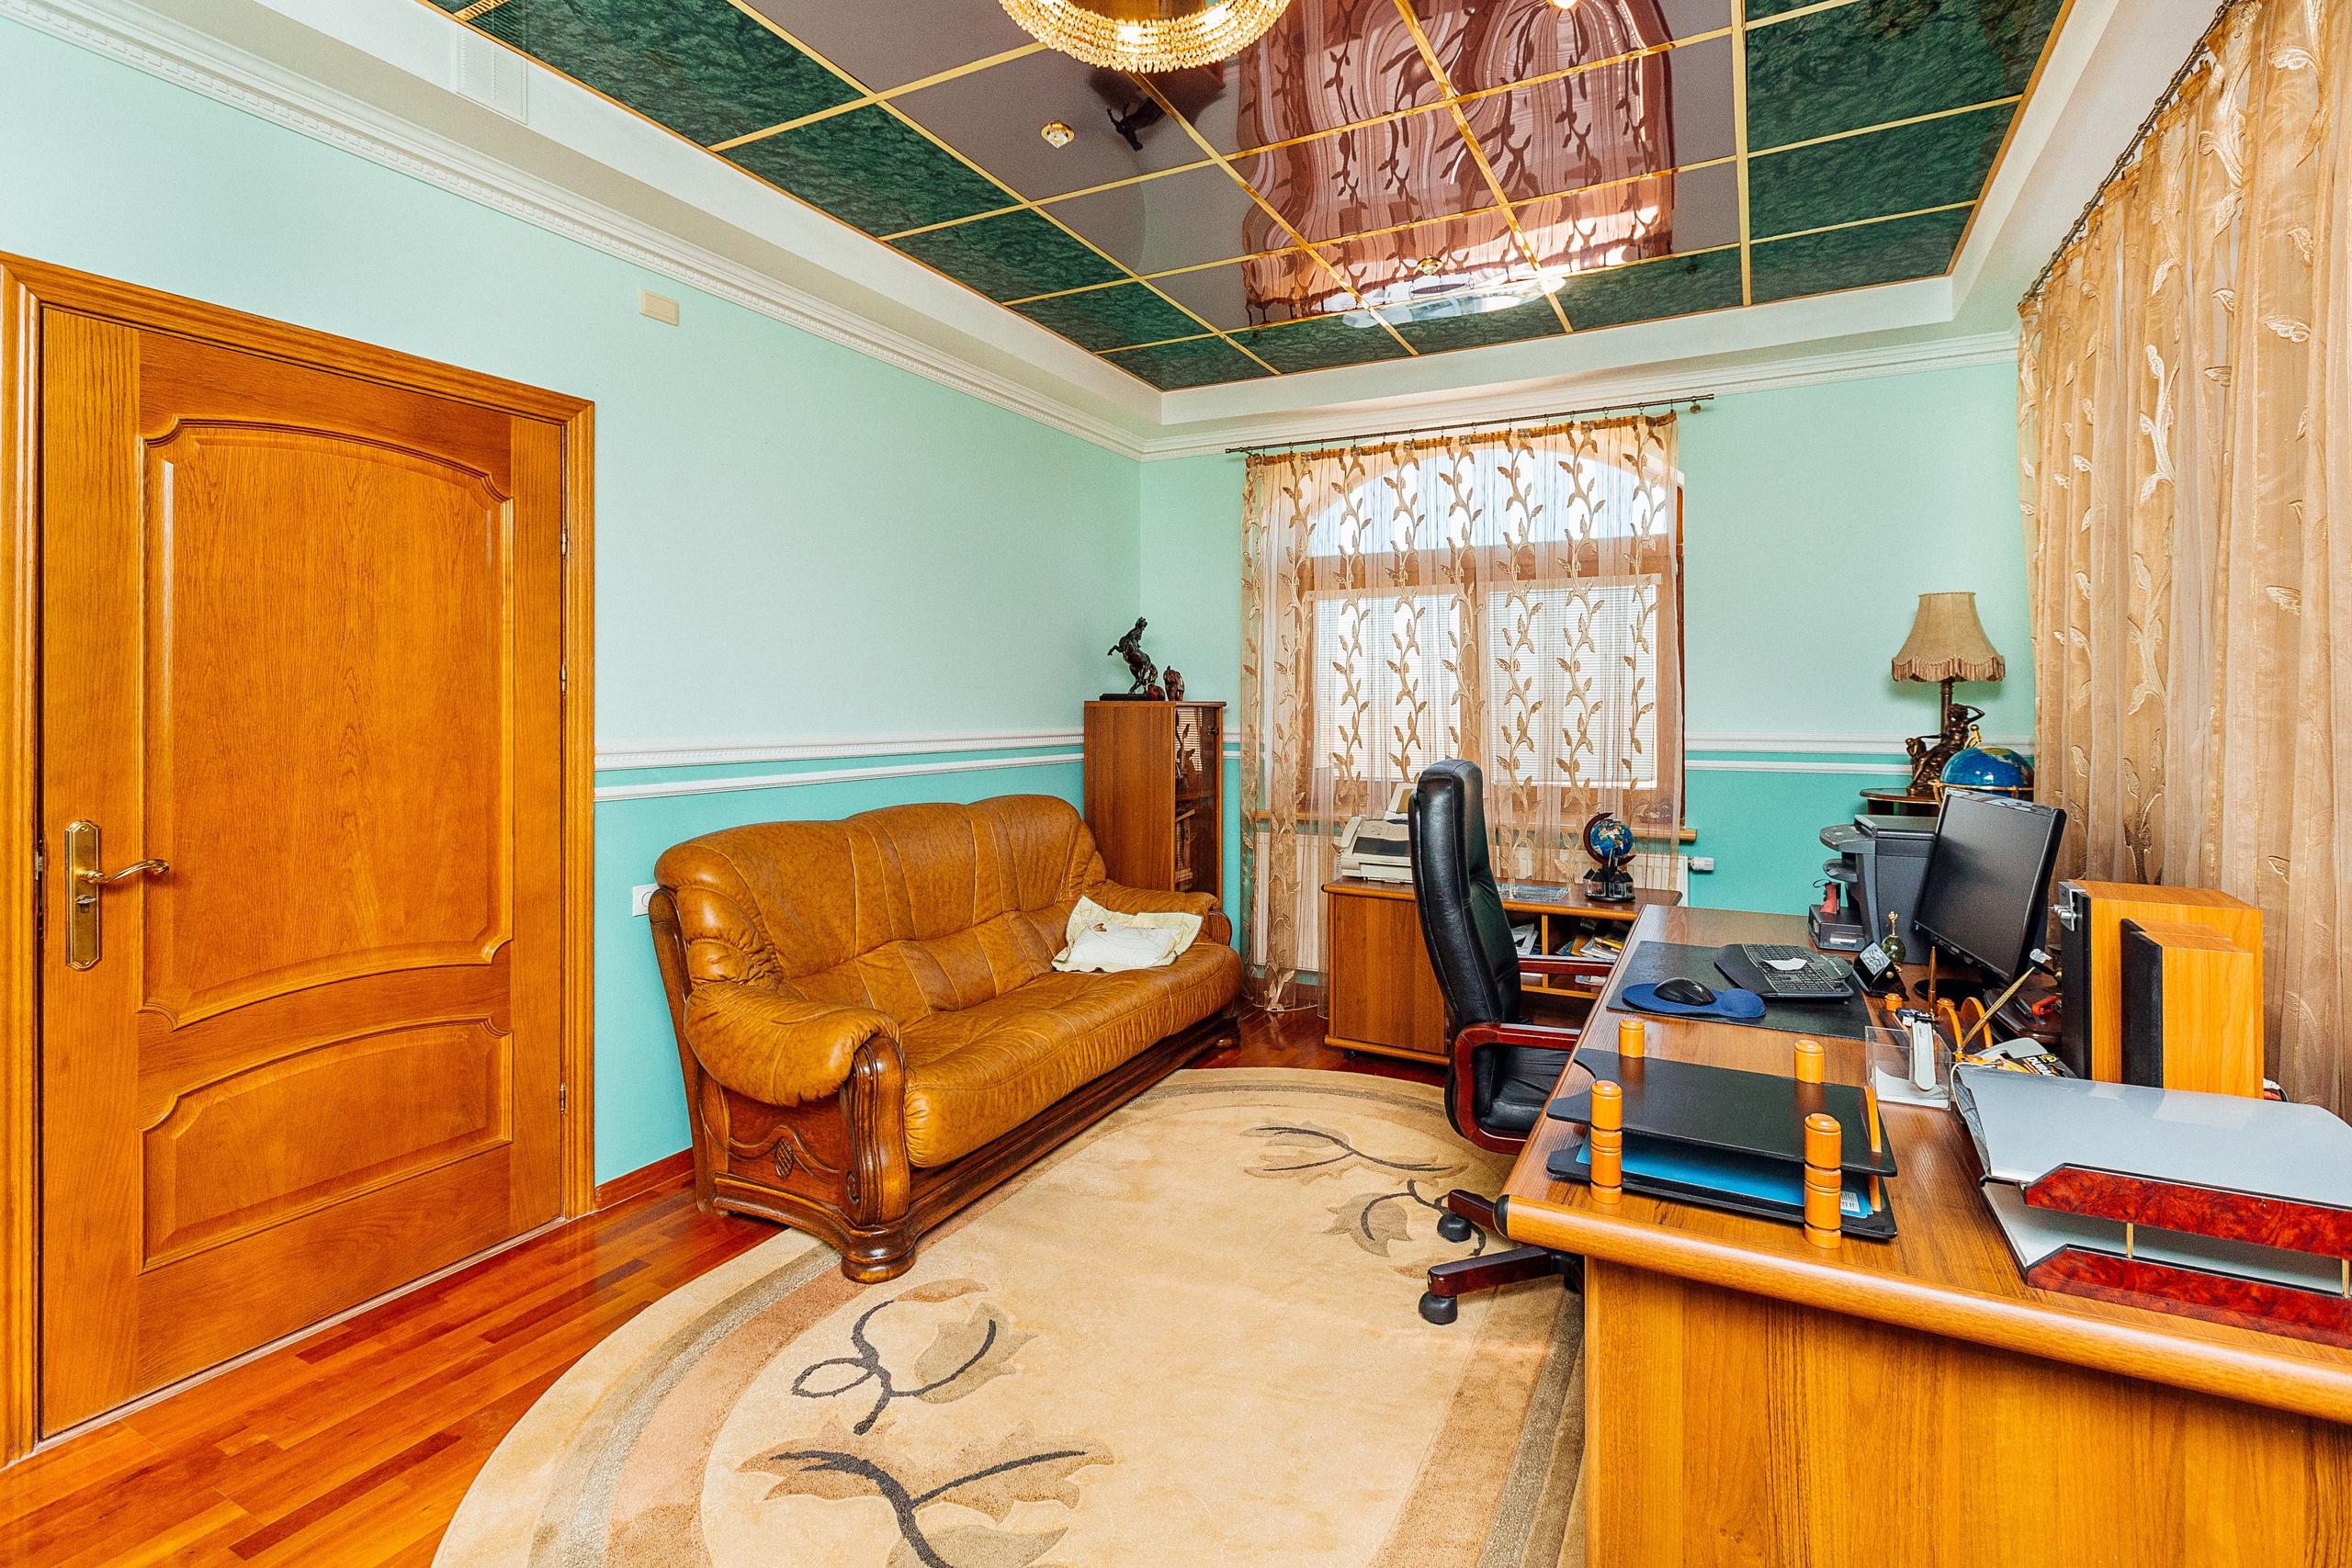 Квартира в Старом Осколе за 14 миллионов